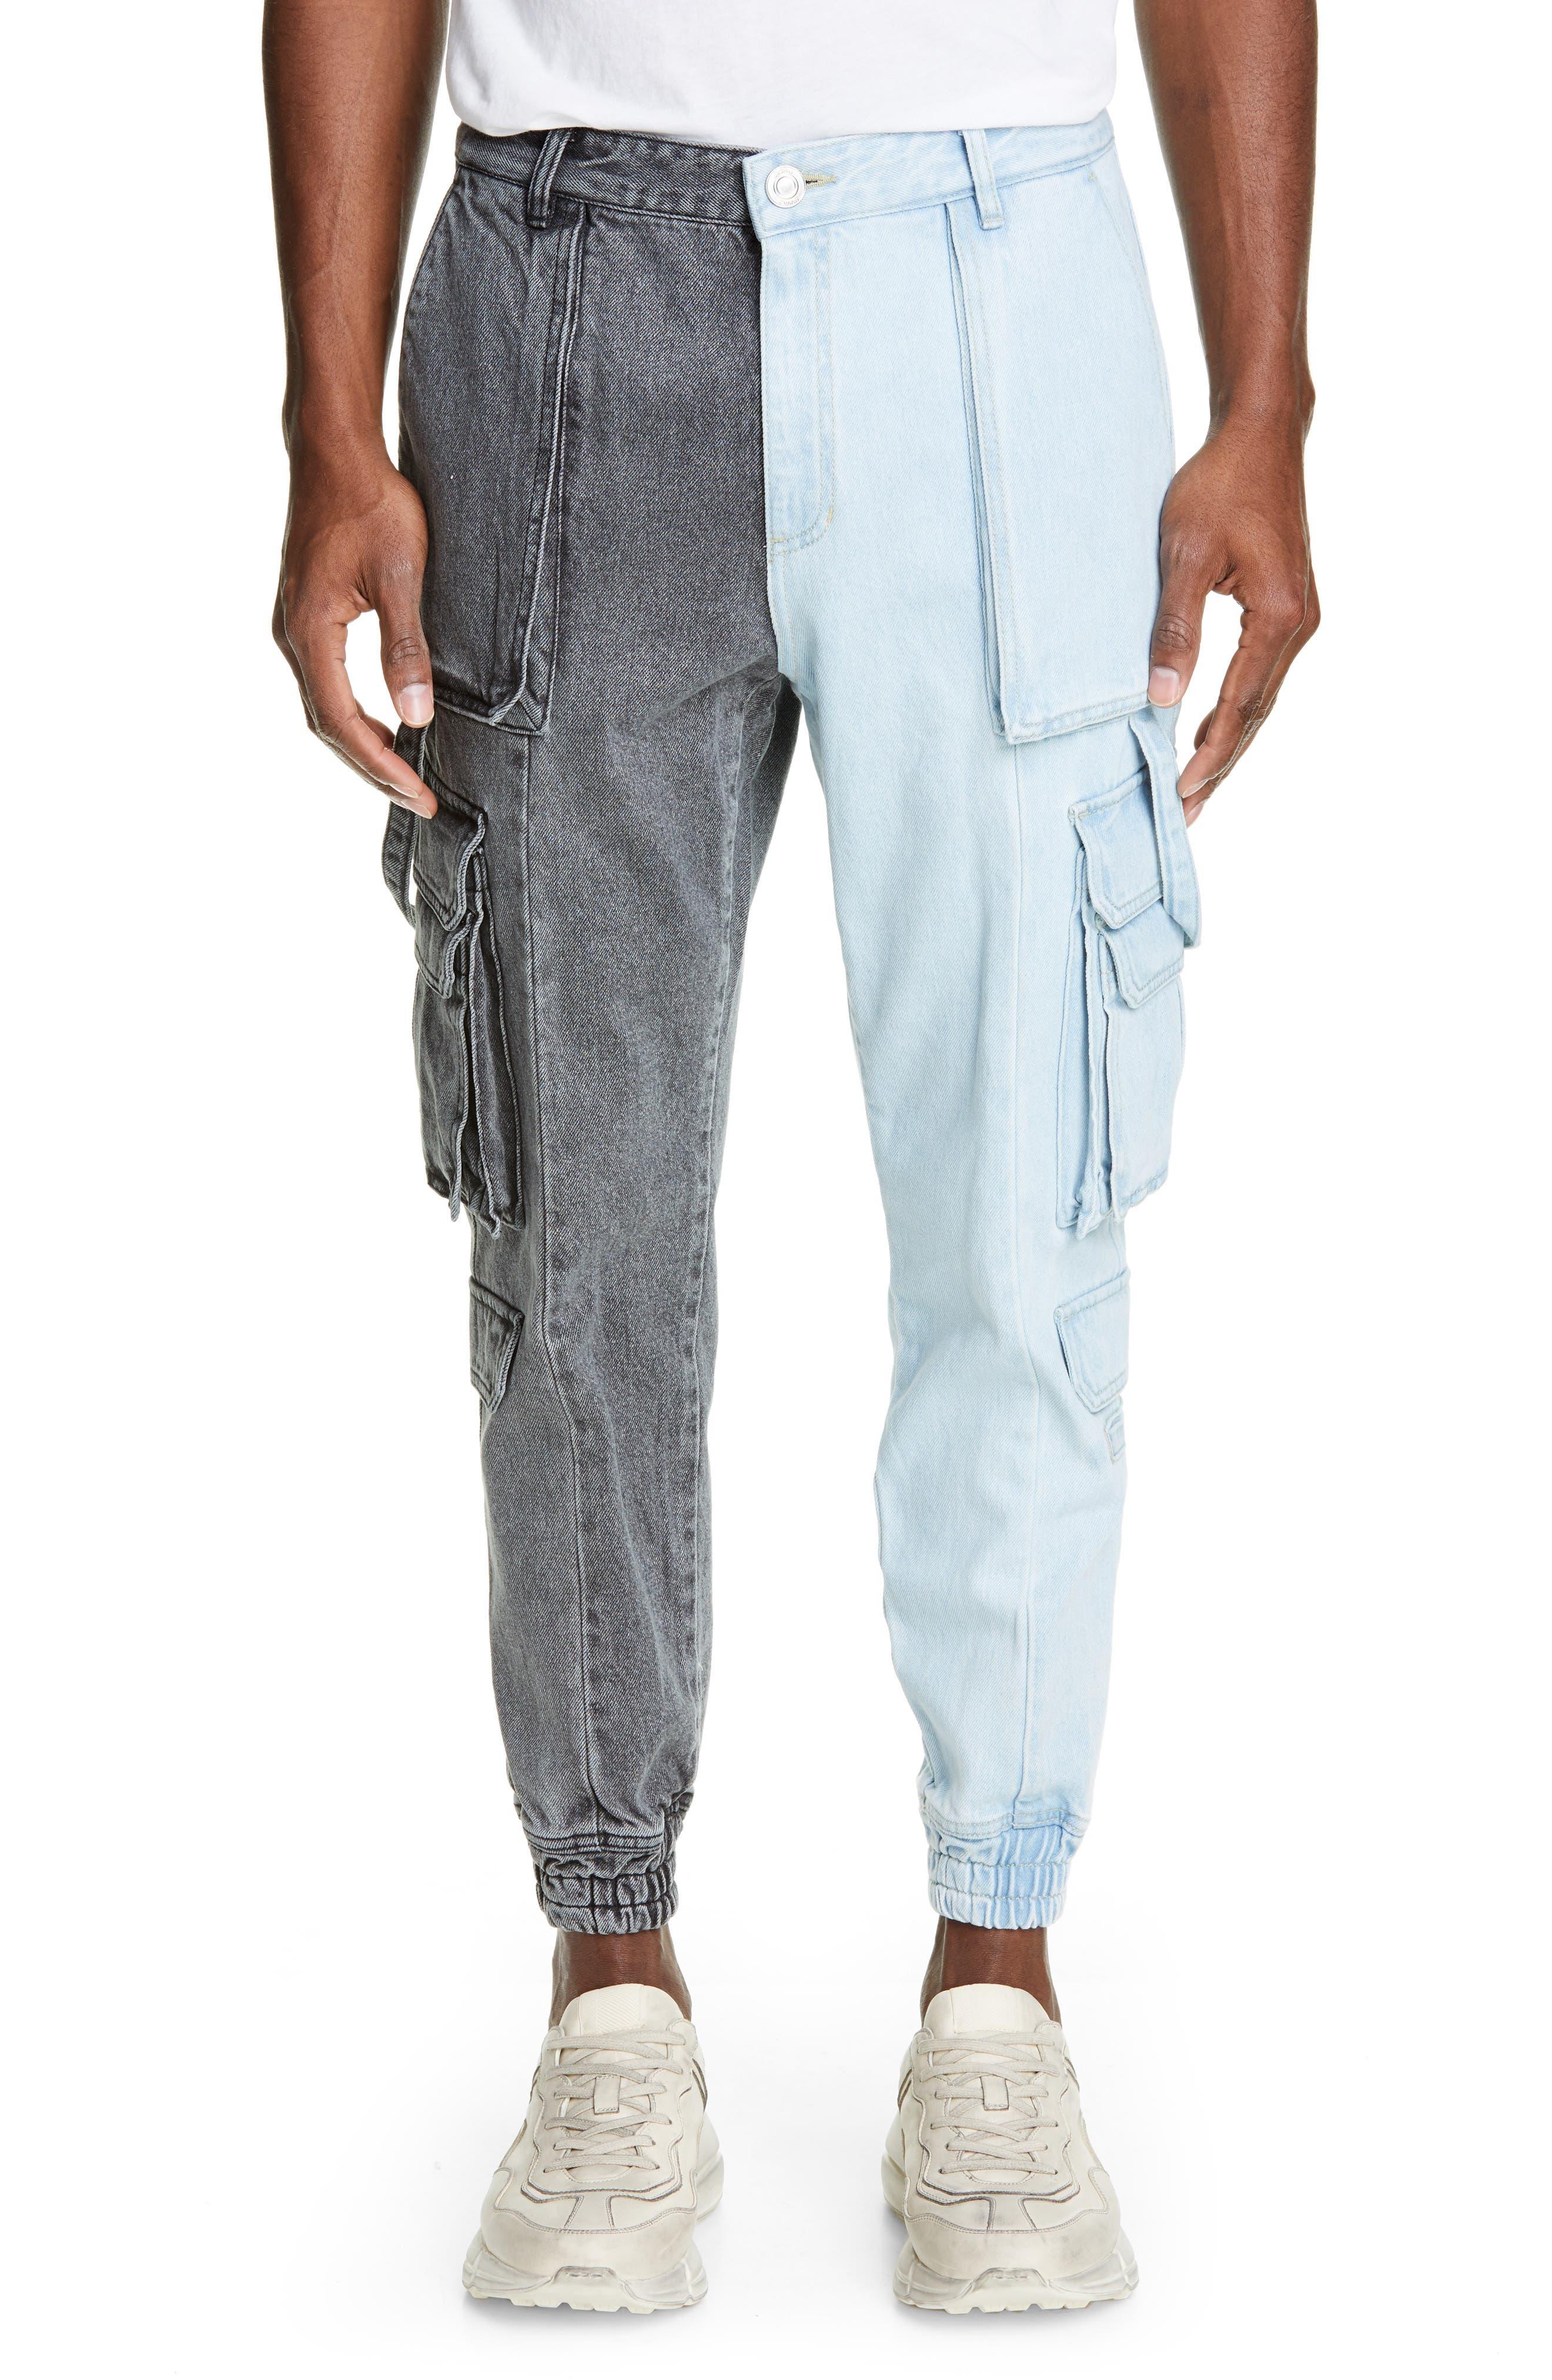 Juun.j Two-Tone Denim Cargo Pilot Pants, Black